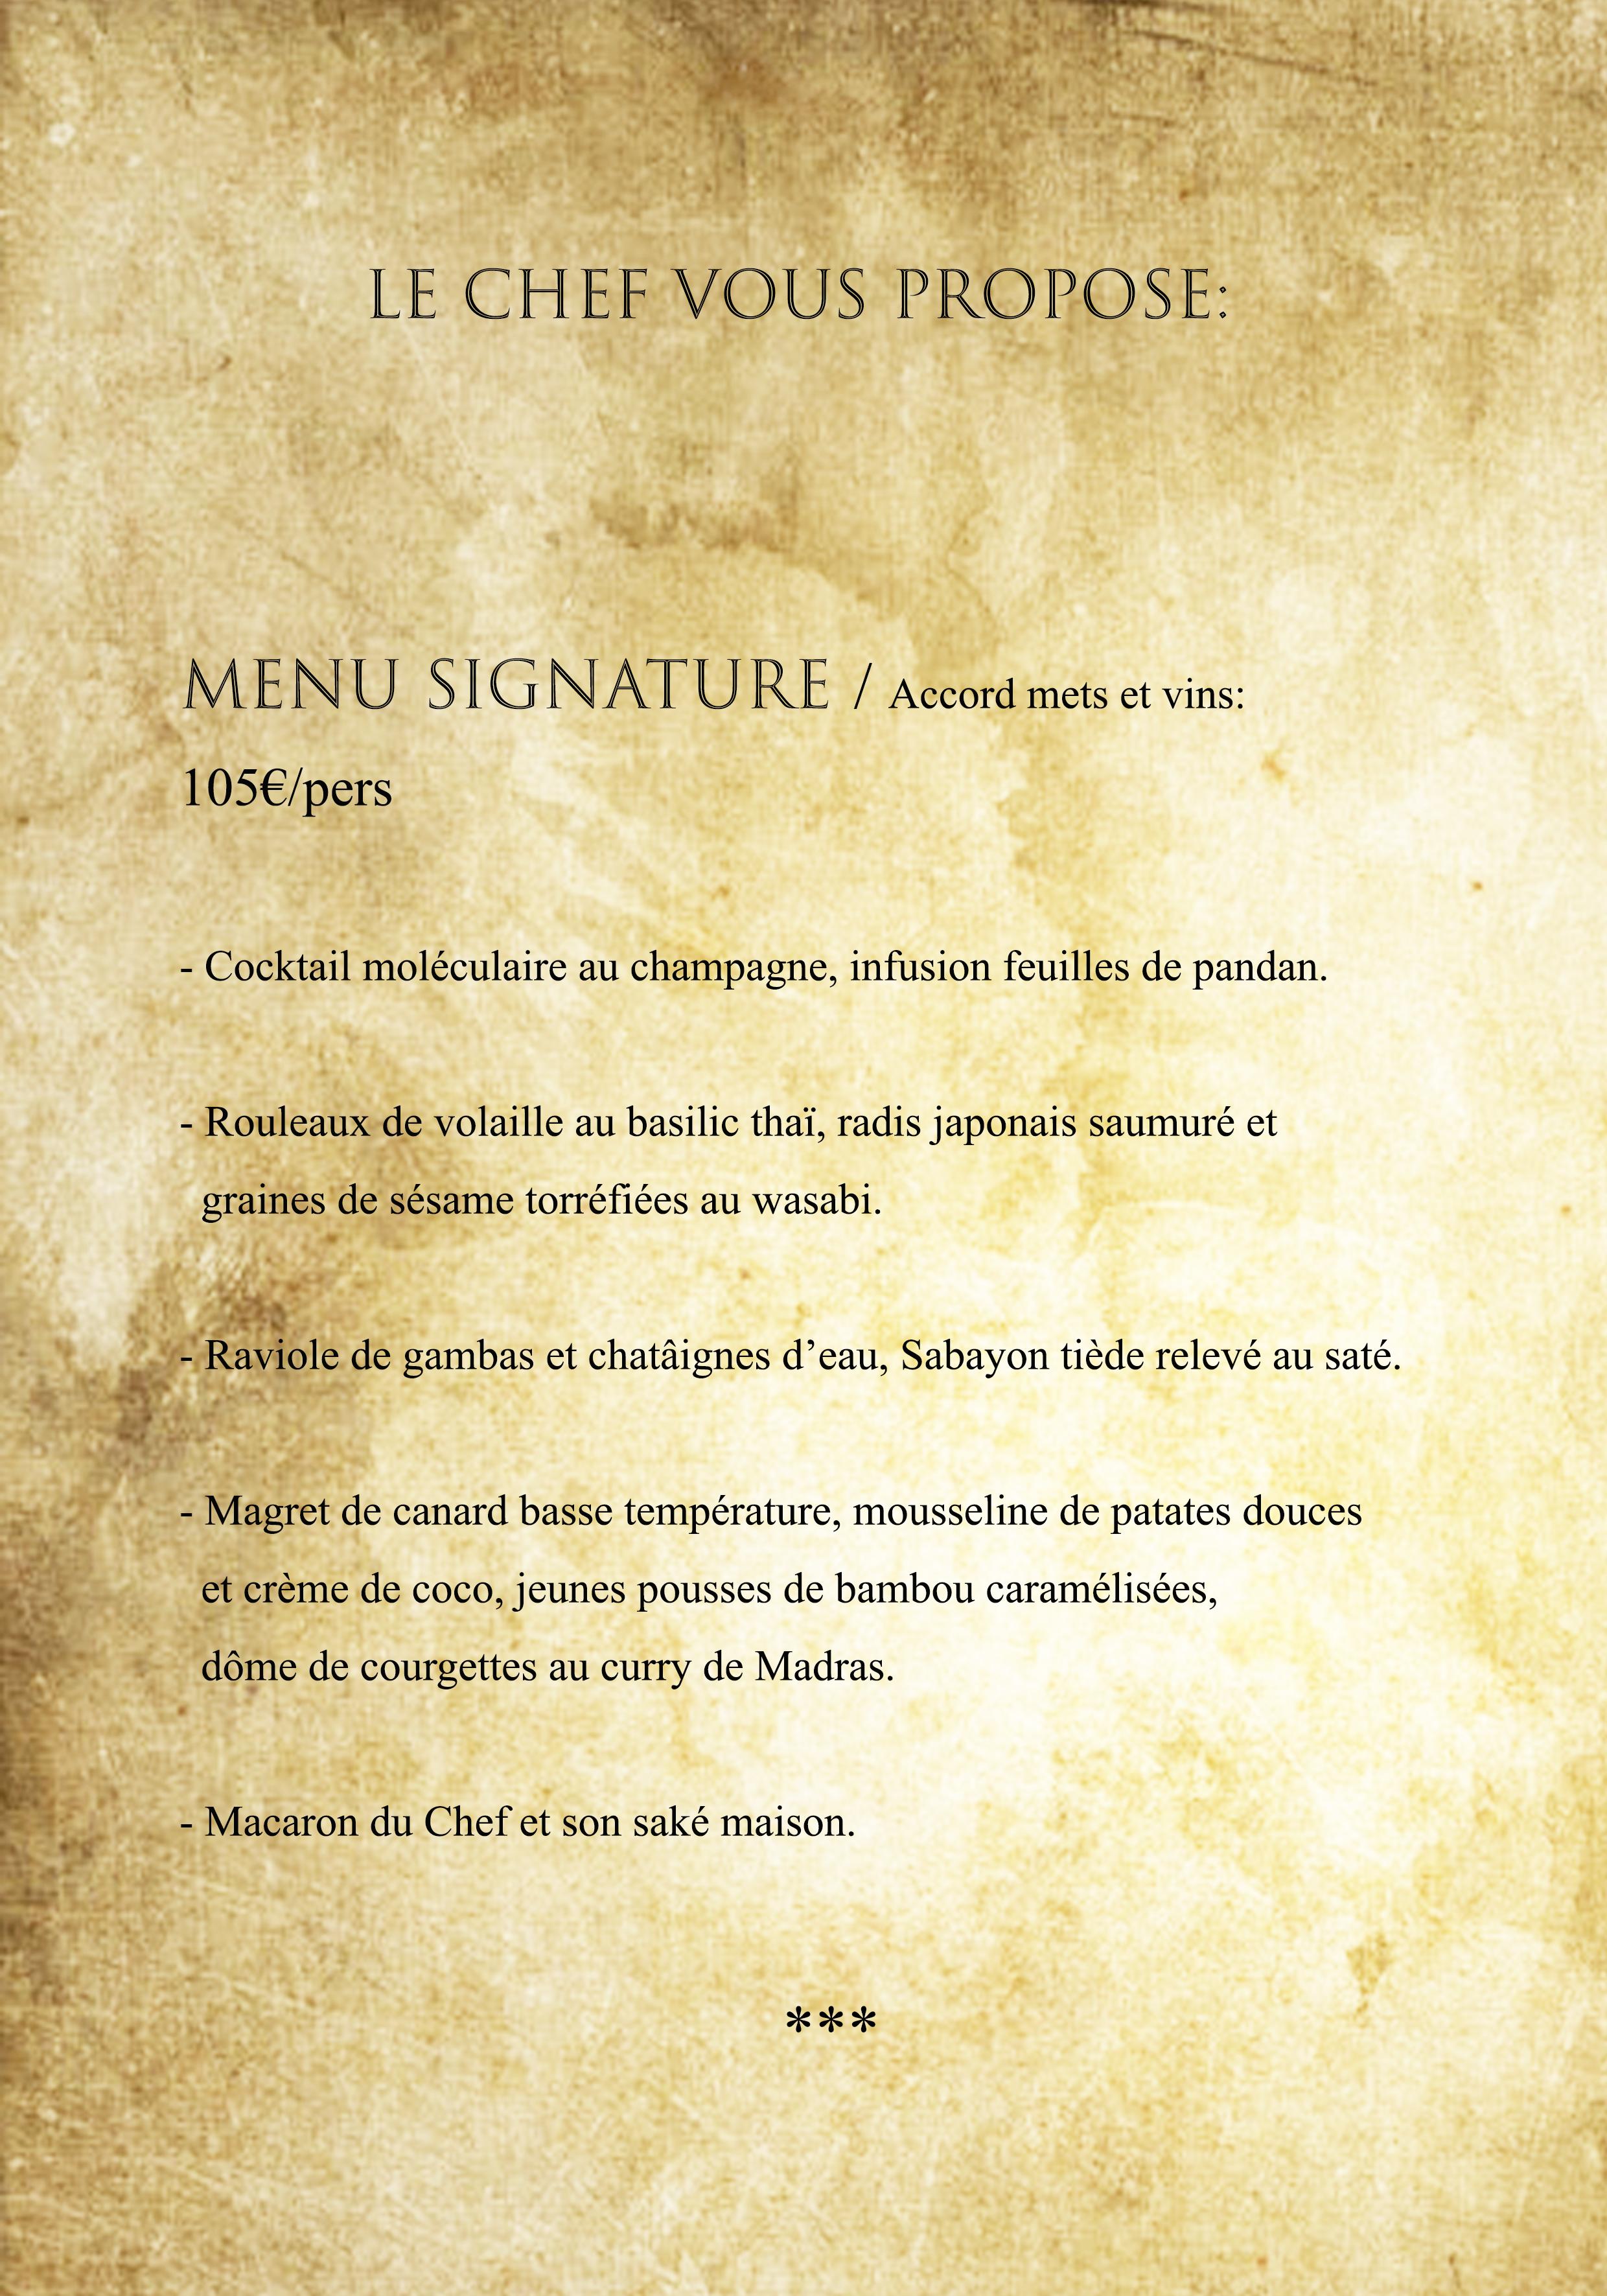 Menu Signature FT 2020